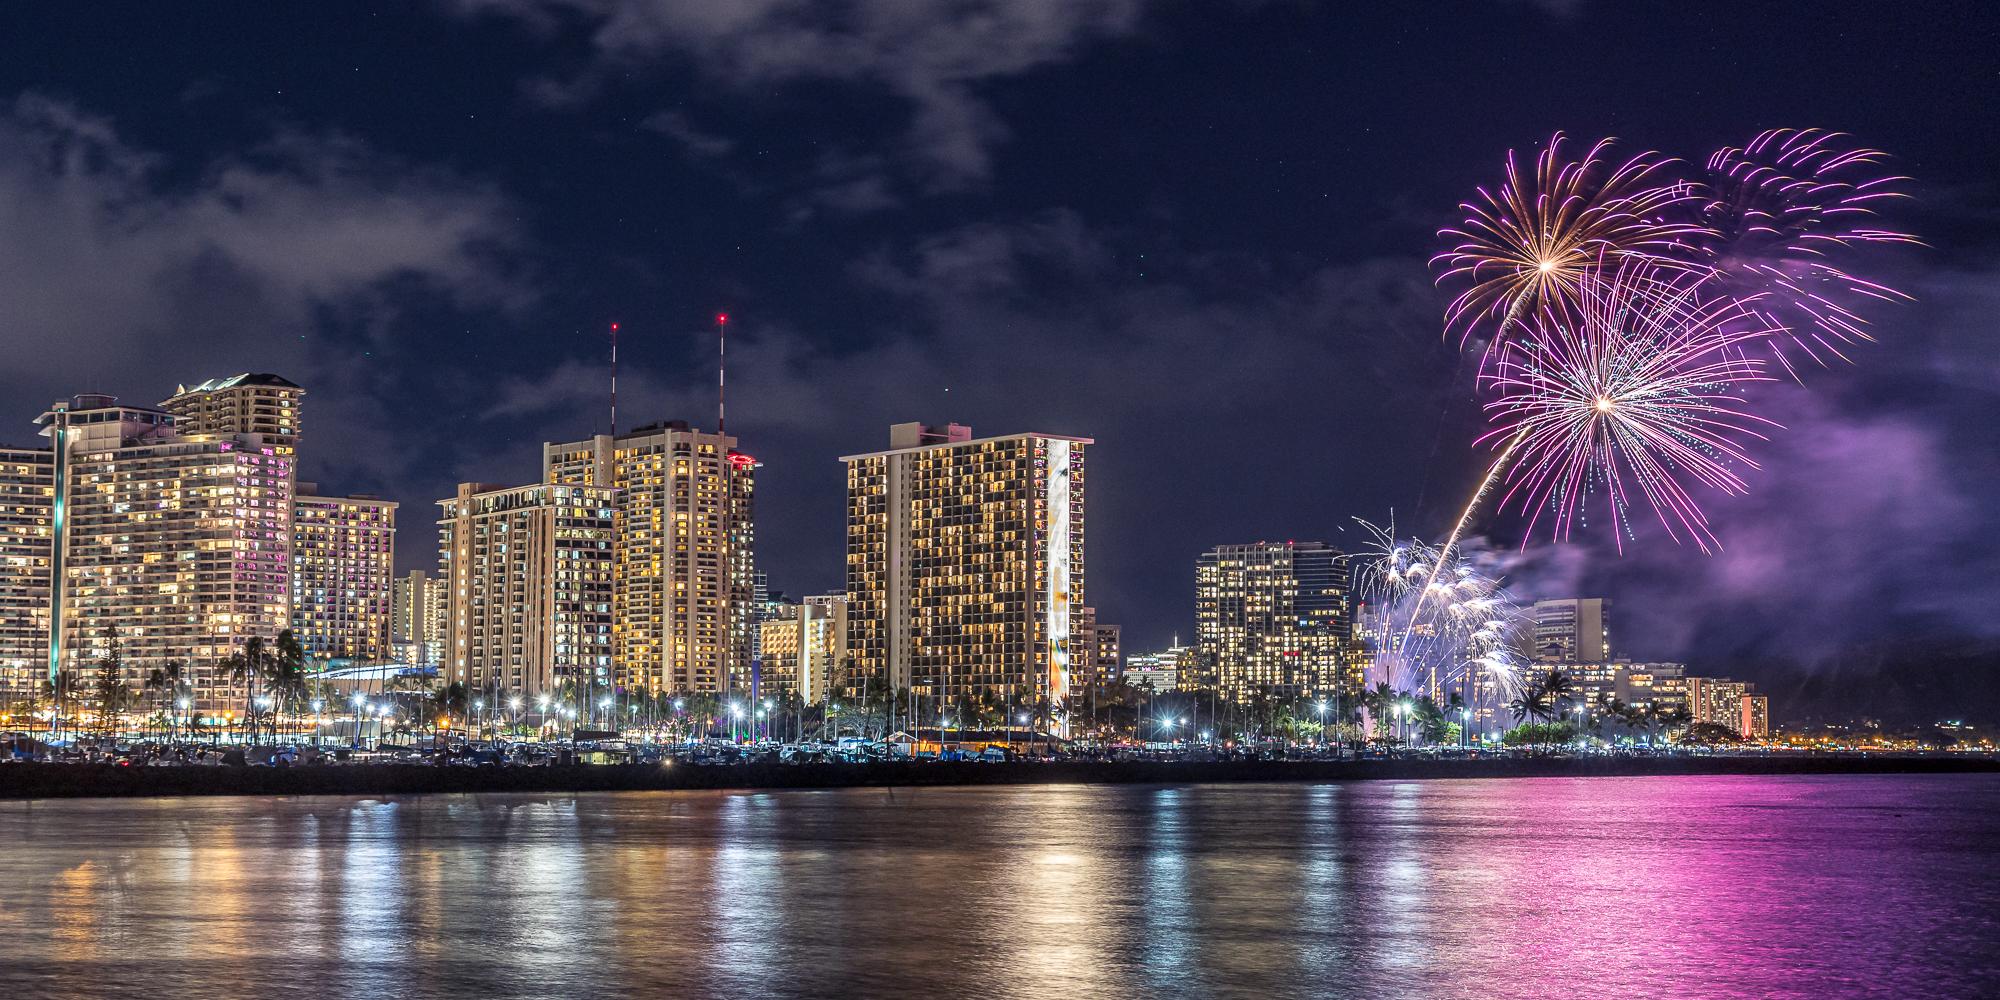 Hilton Hawaiian Village Friday night fireworks.